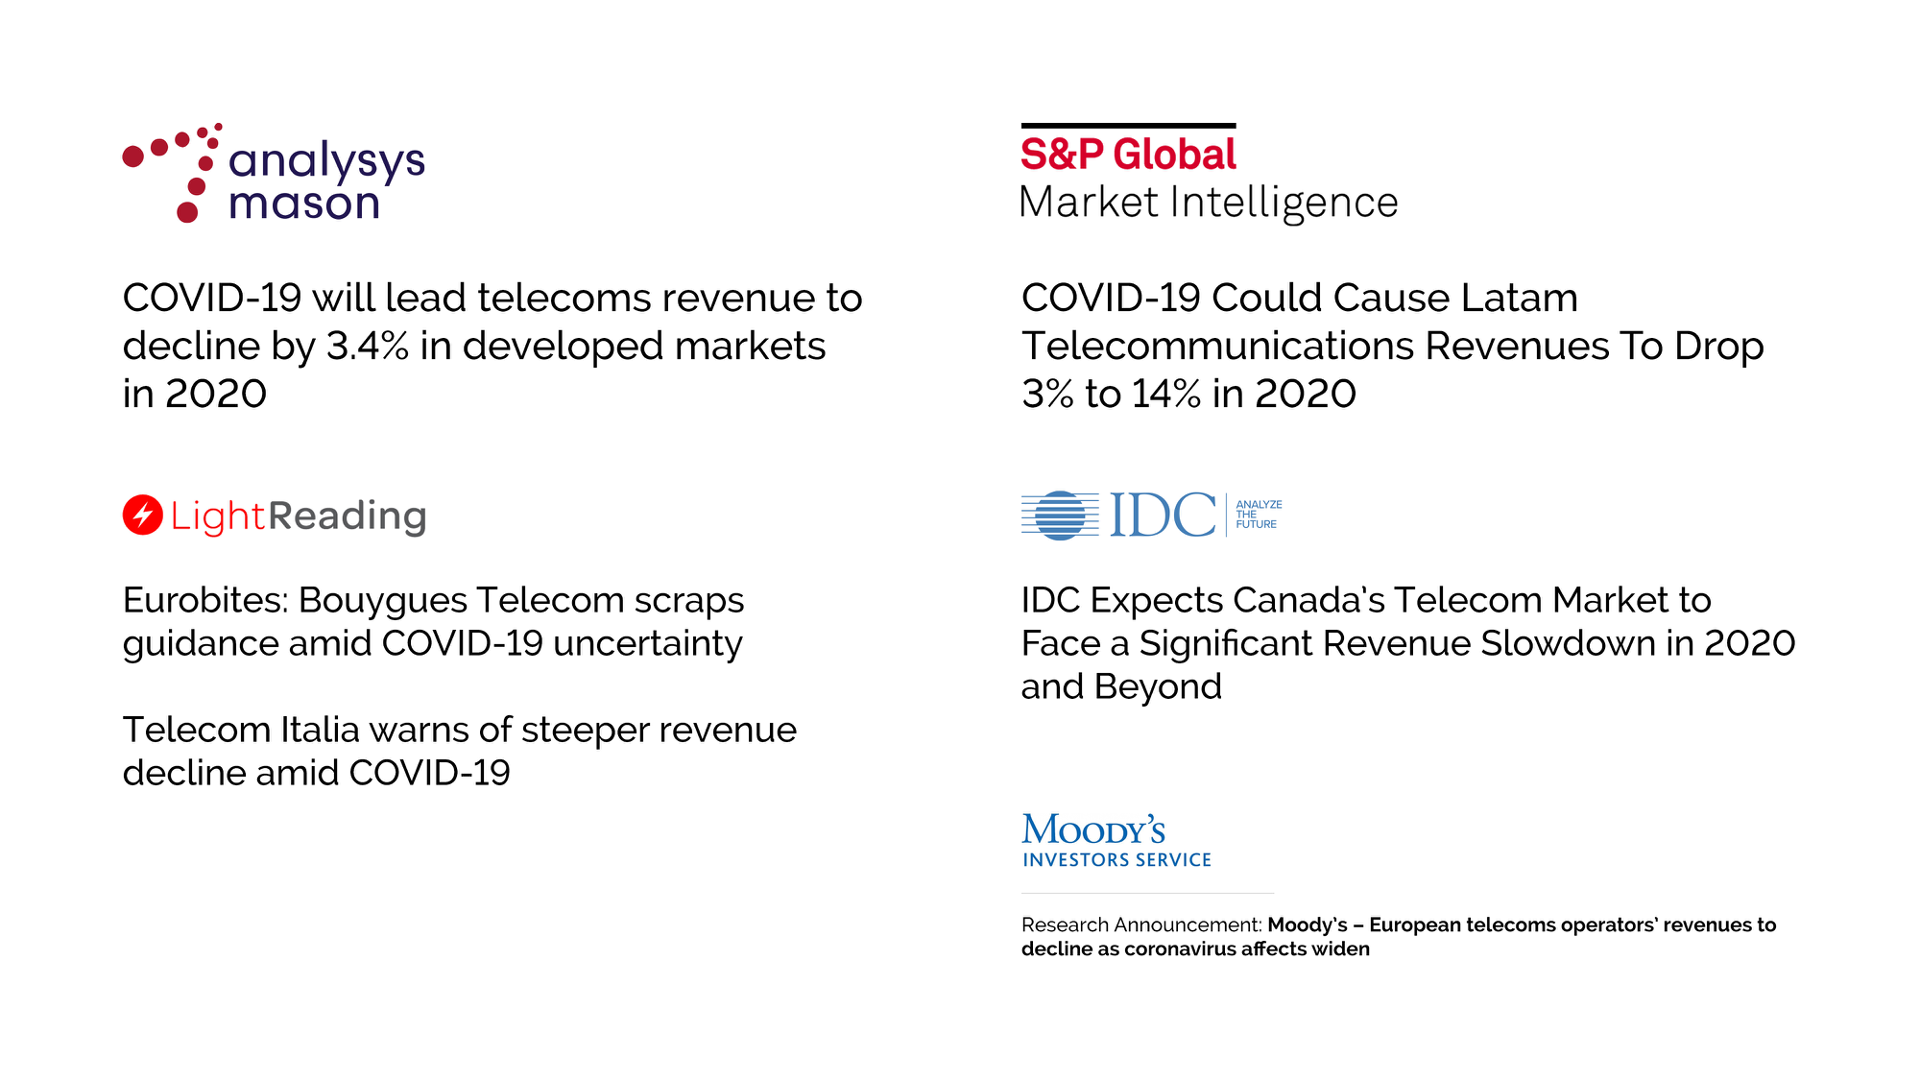 Covid-19 telecoms headlines